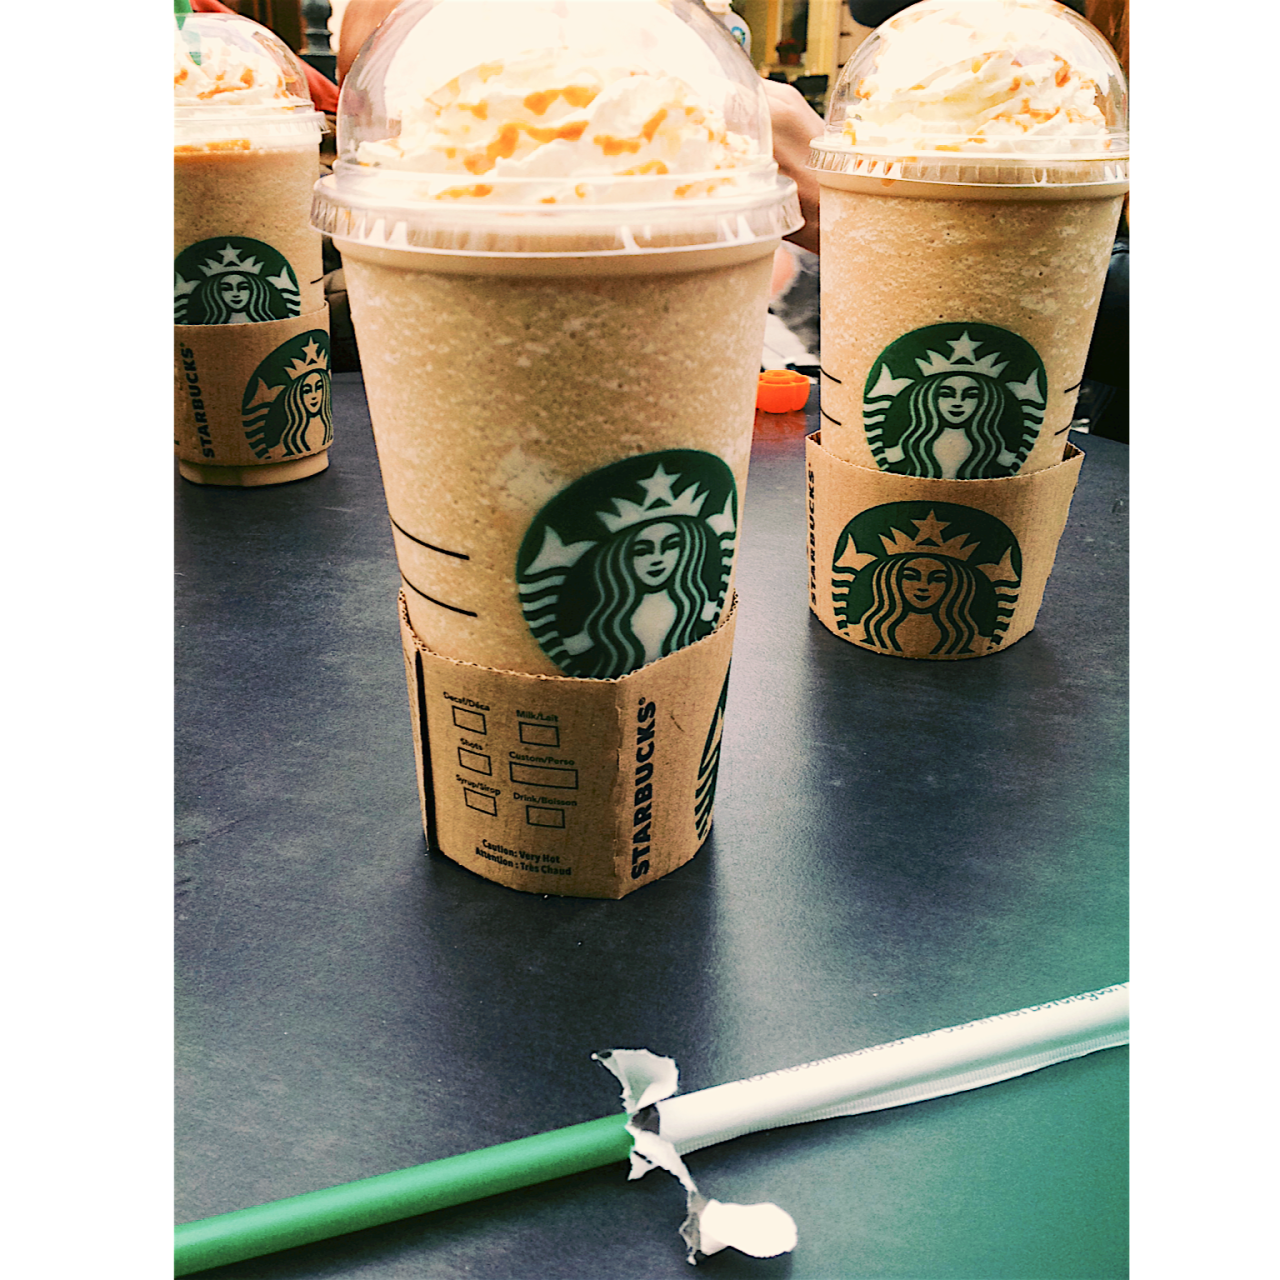 Pinterest candlesonmycake Starbucks, Hot coffee